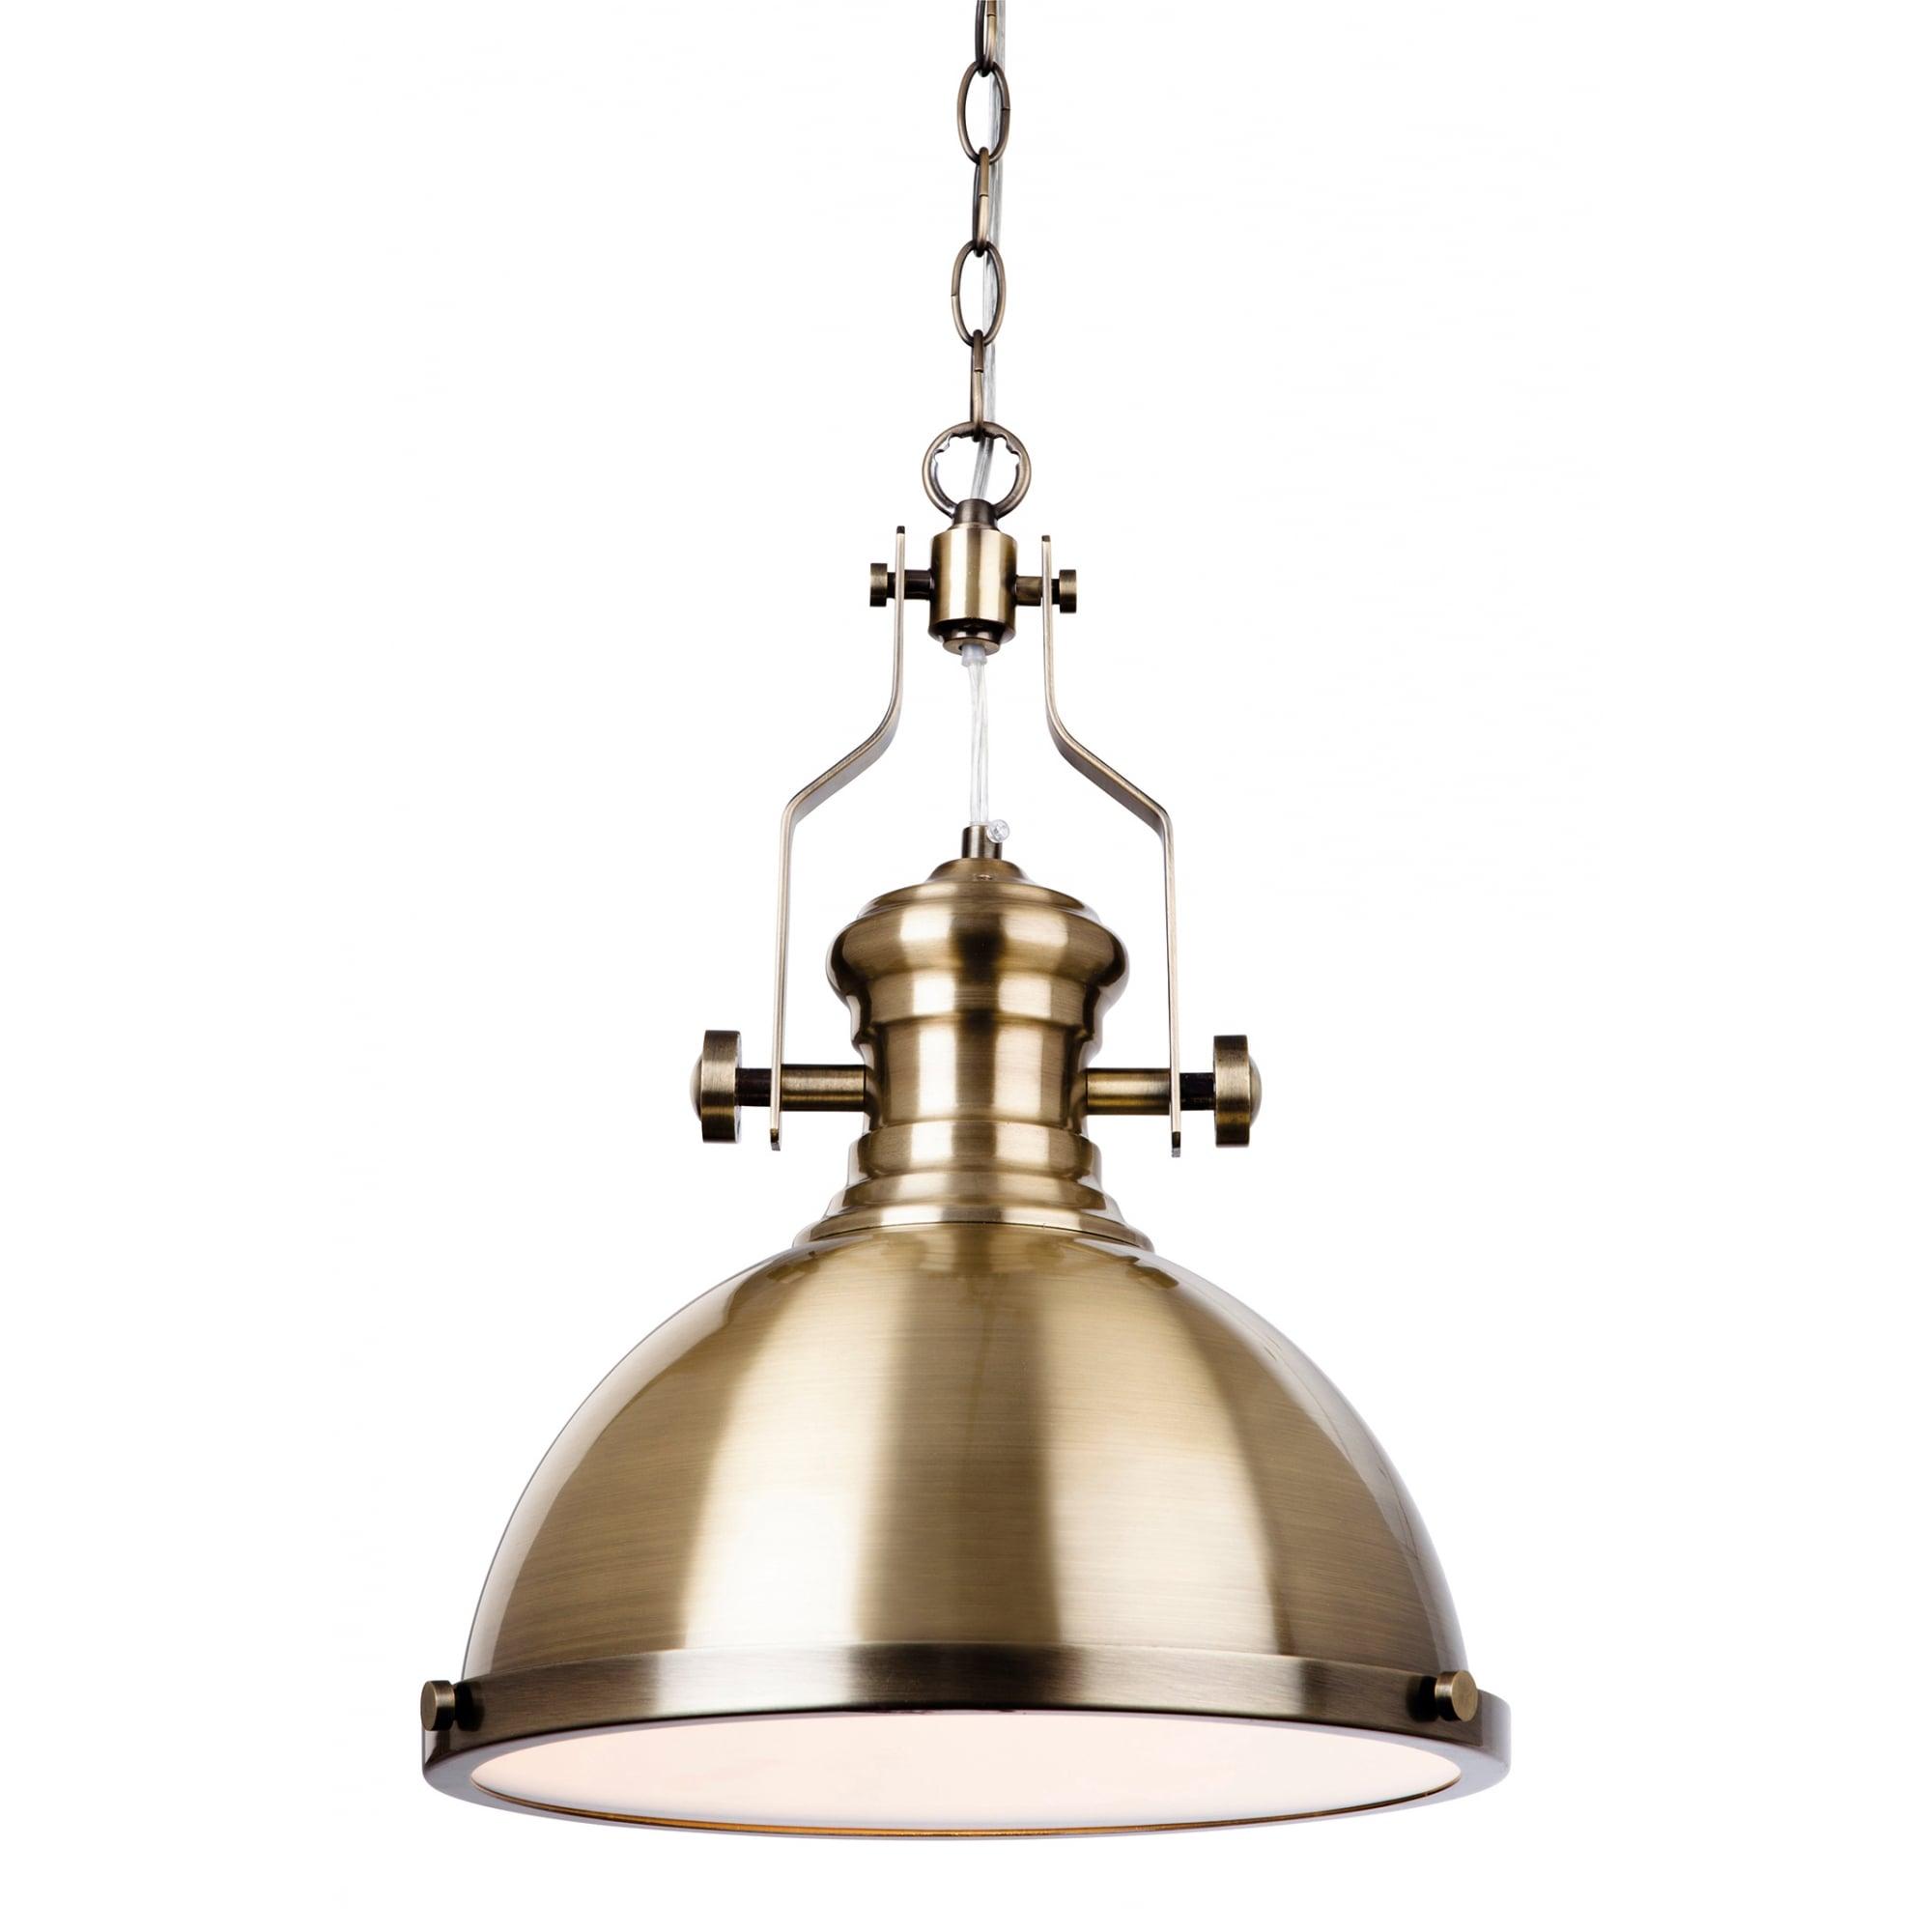 Firstlight 5909ab Modern Industrial Bronze Hanging Pendant Light Ideas4lighting Sku20366i4l